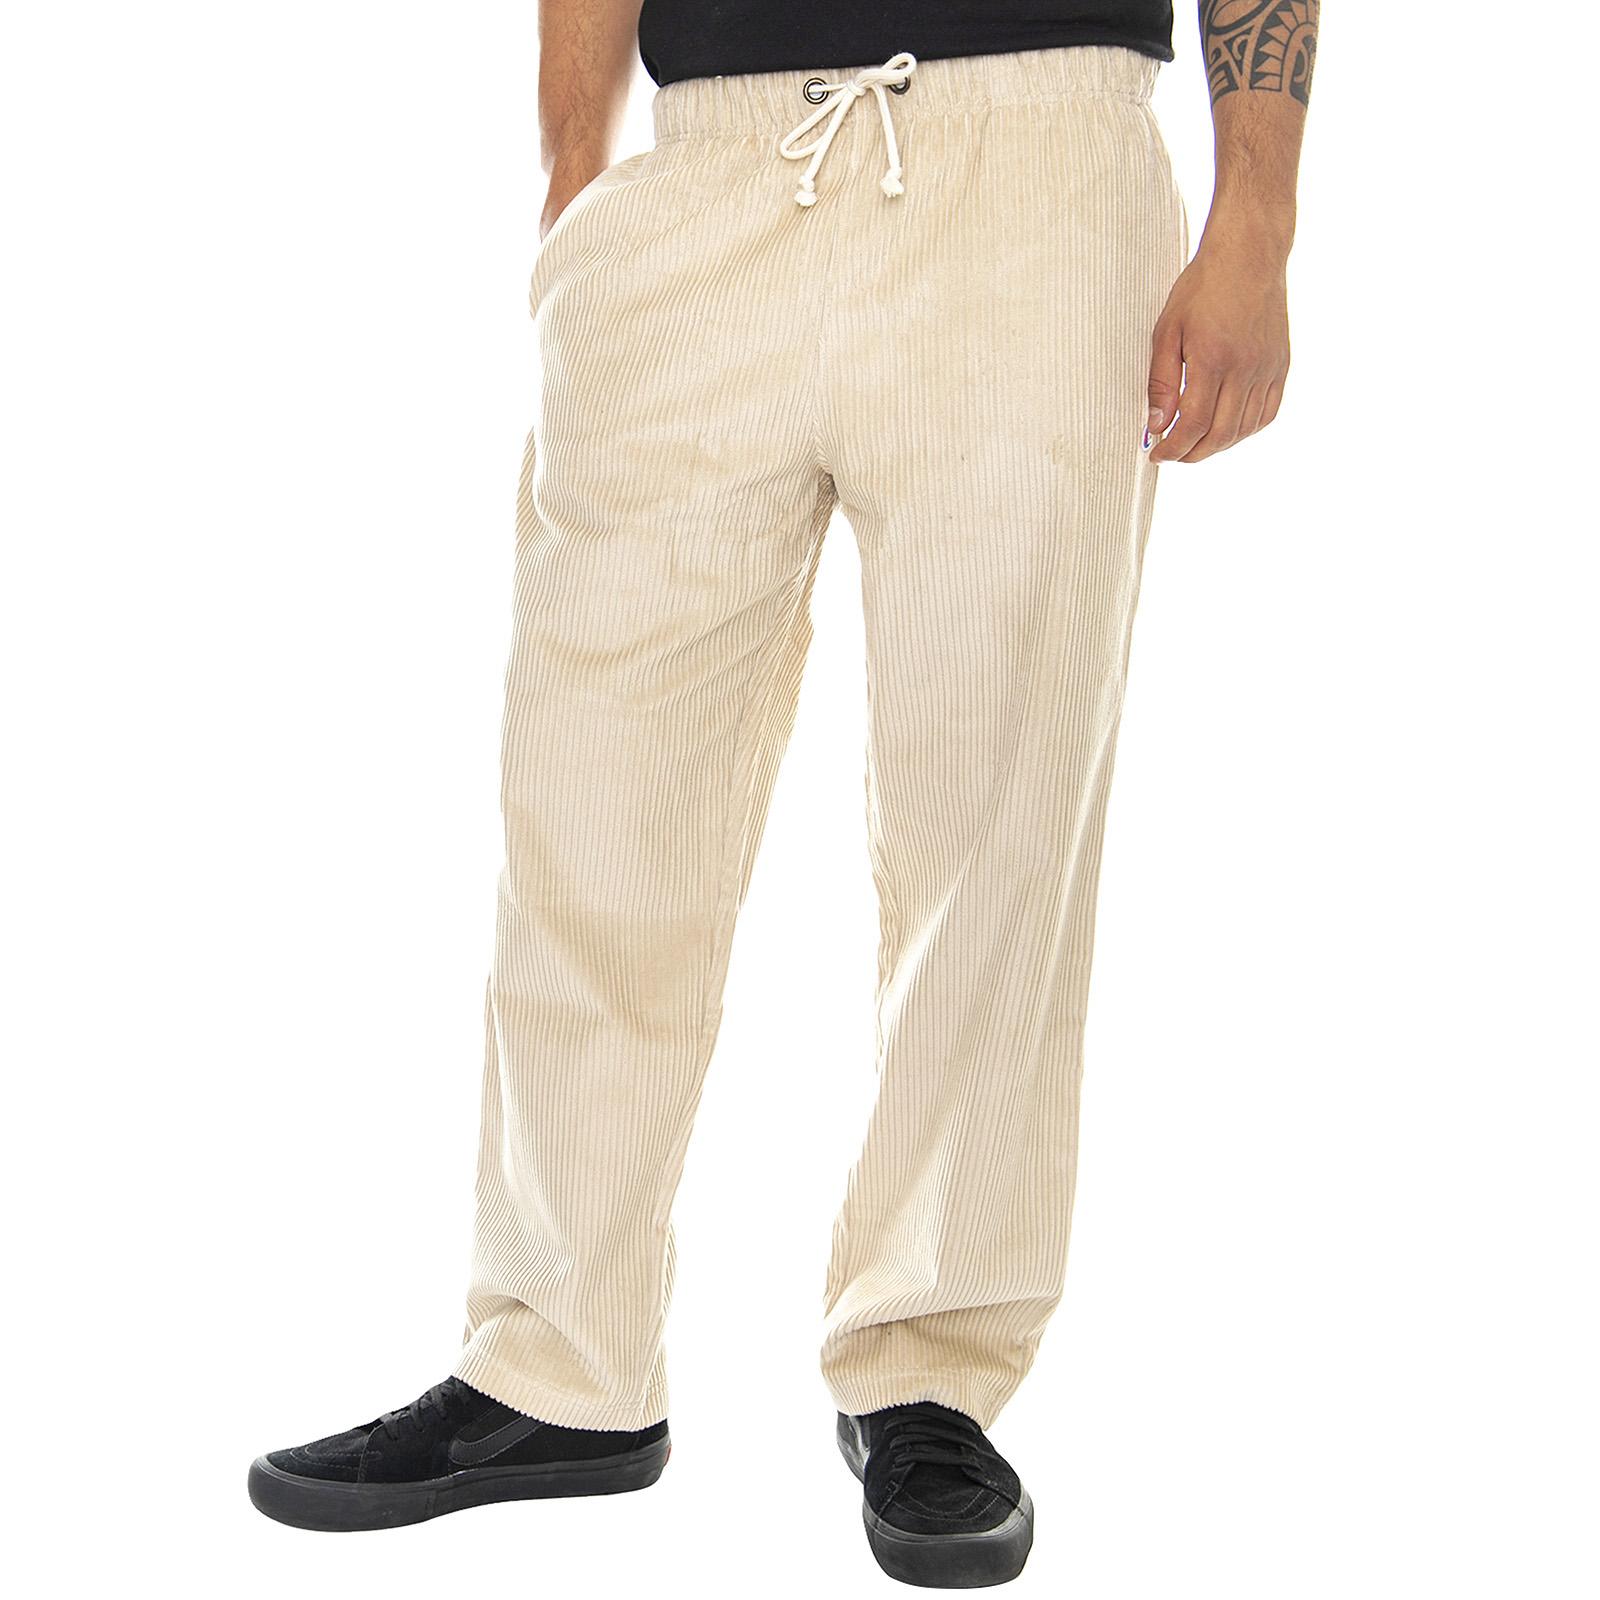 vendita calda online a0cea dc0b8 Dettagli su Champion Spg Pants - Beige - Pantaloni Velluto Uomo Beige Beige